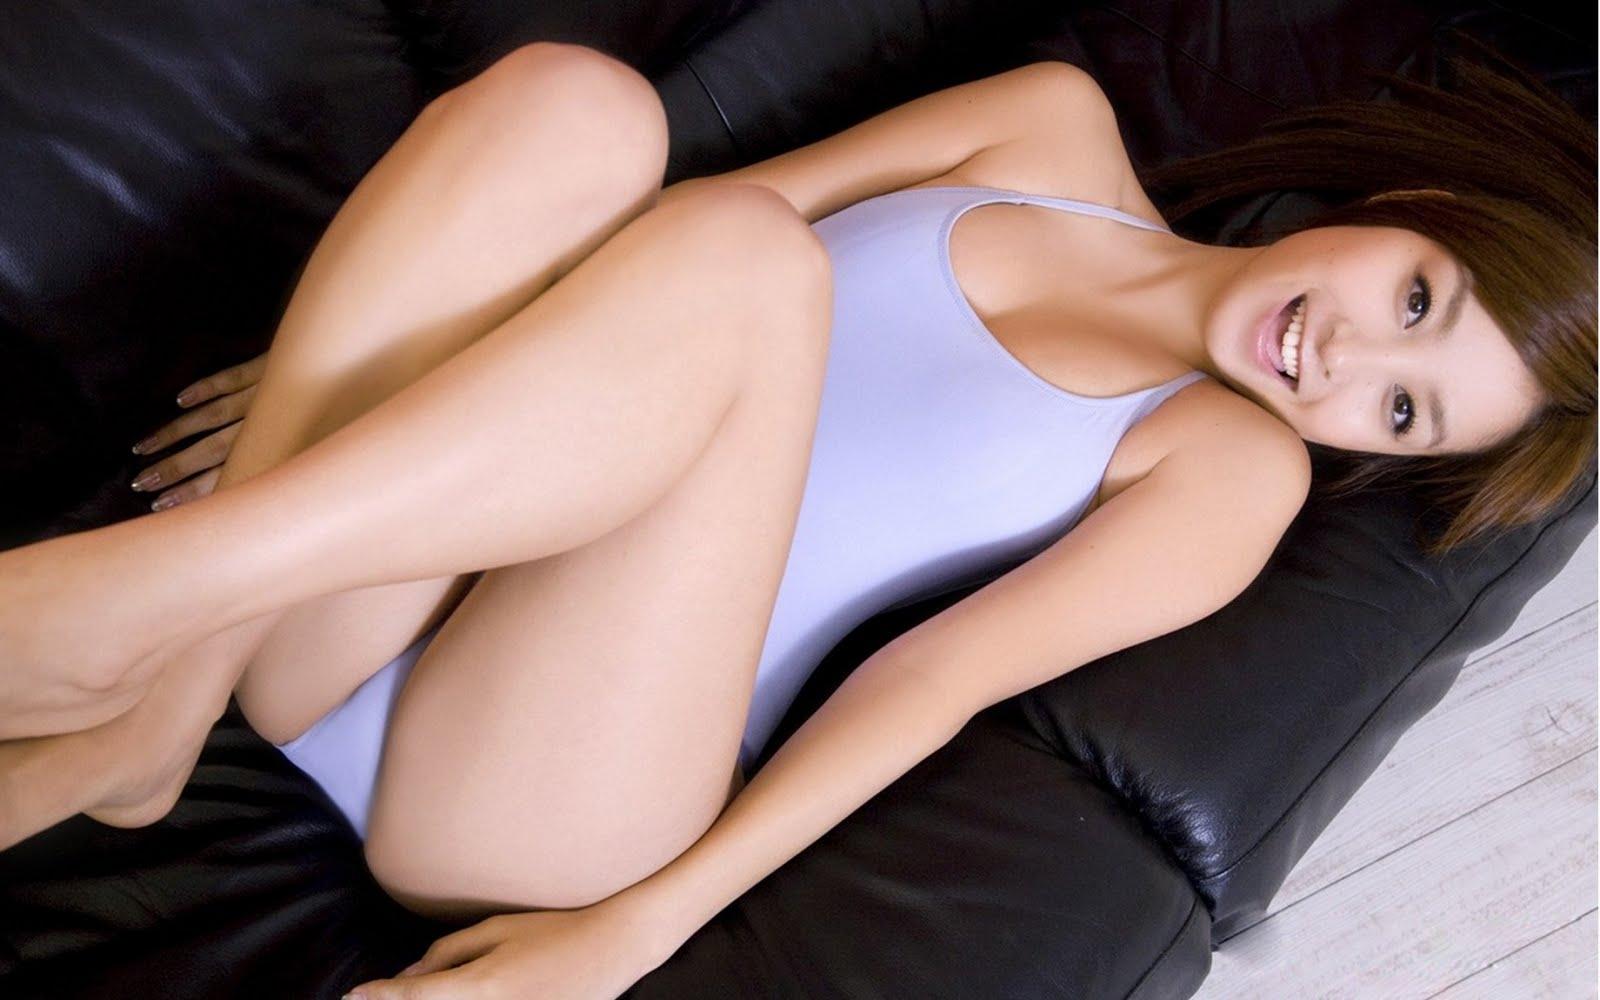 http://2.bp.blogspot.com/-VE5Uj-3xjB4/TVfPxBoU-yI/AAAAAAAAC-g/z45-Ebhu8bU/s1600/sexy_asian_girl.jpg